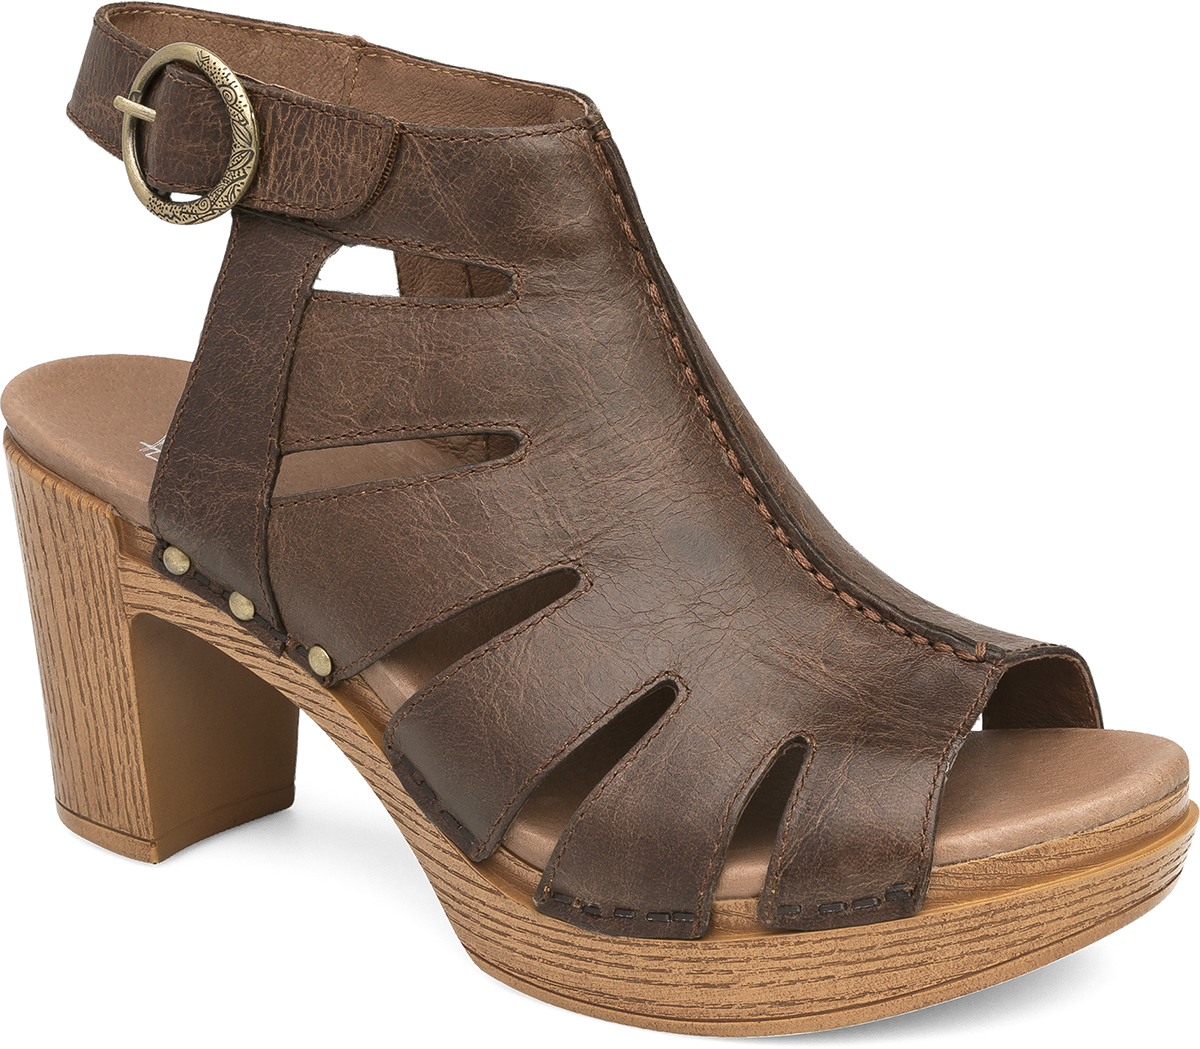 Black dansko sandals - Demetra Teak Vintage Pull Up